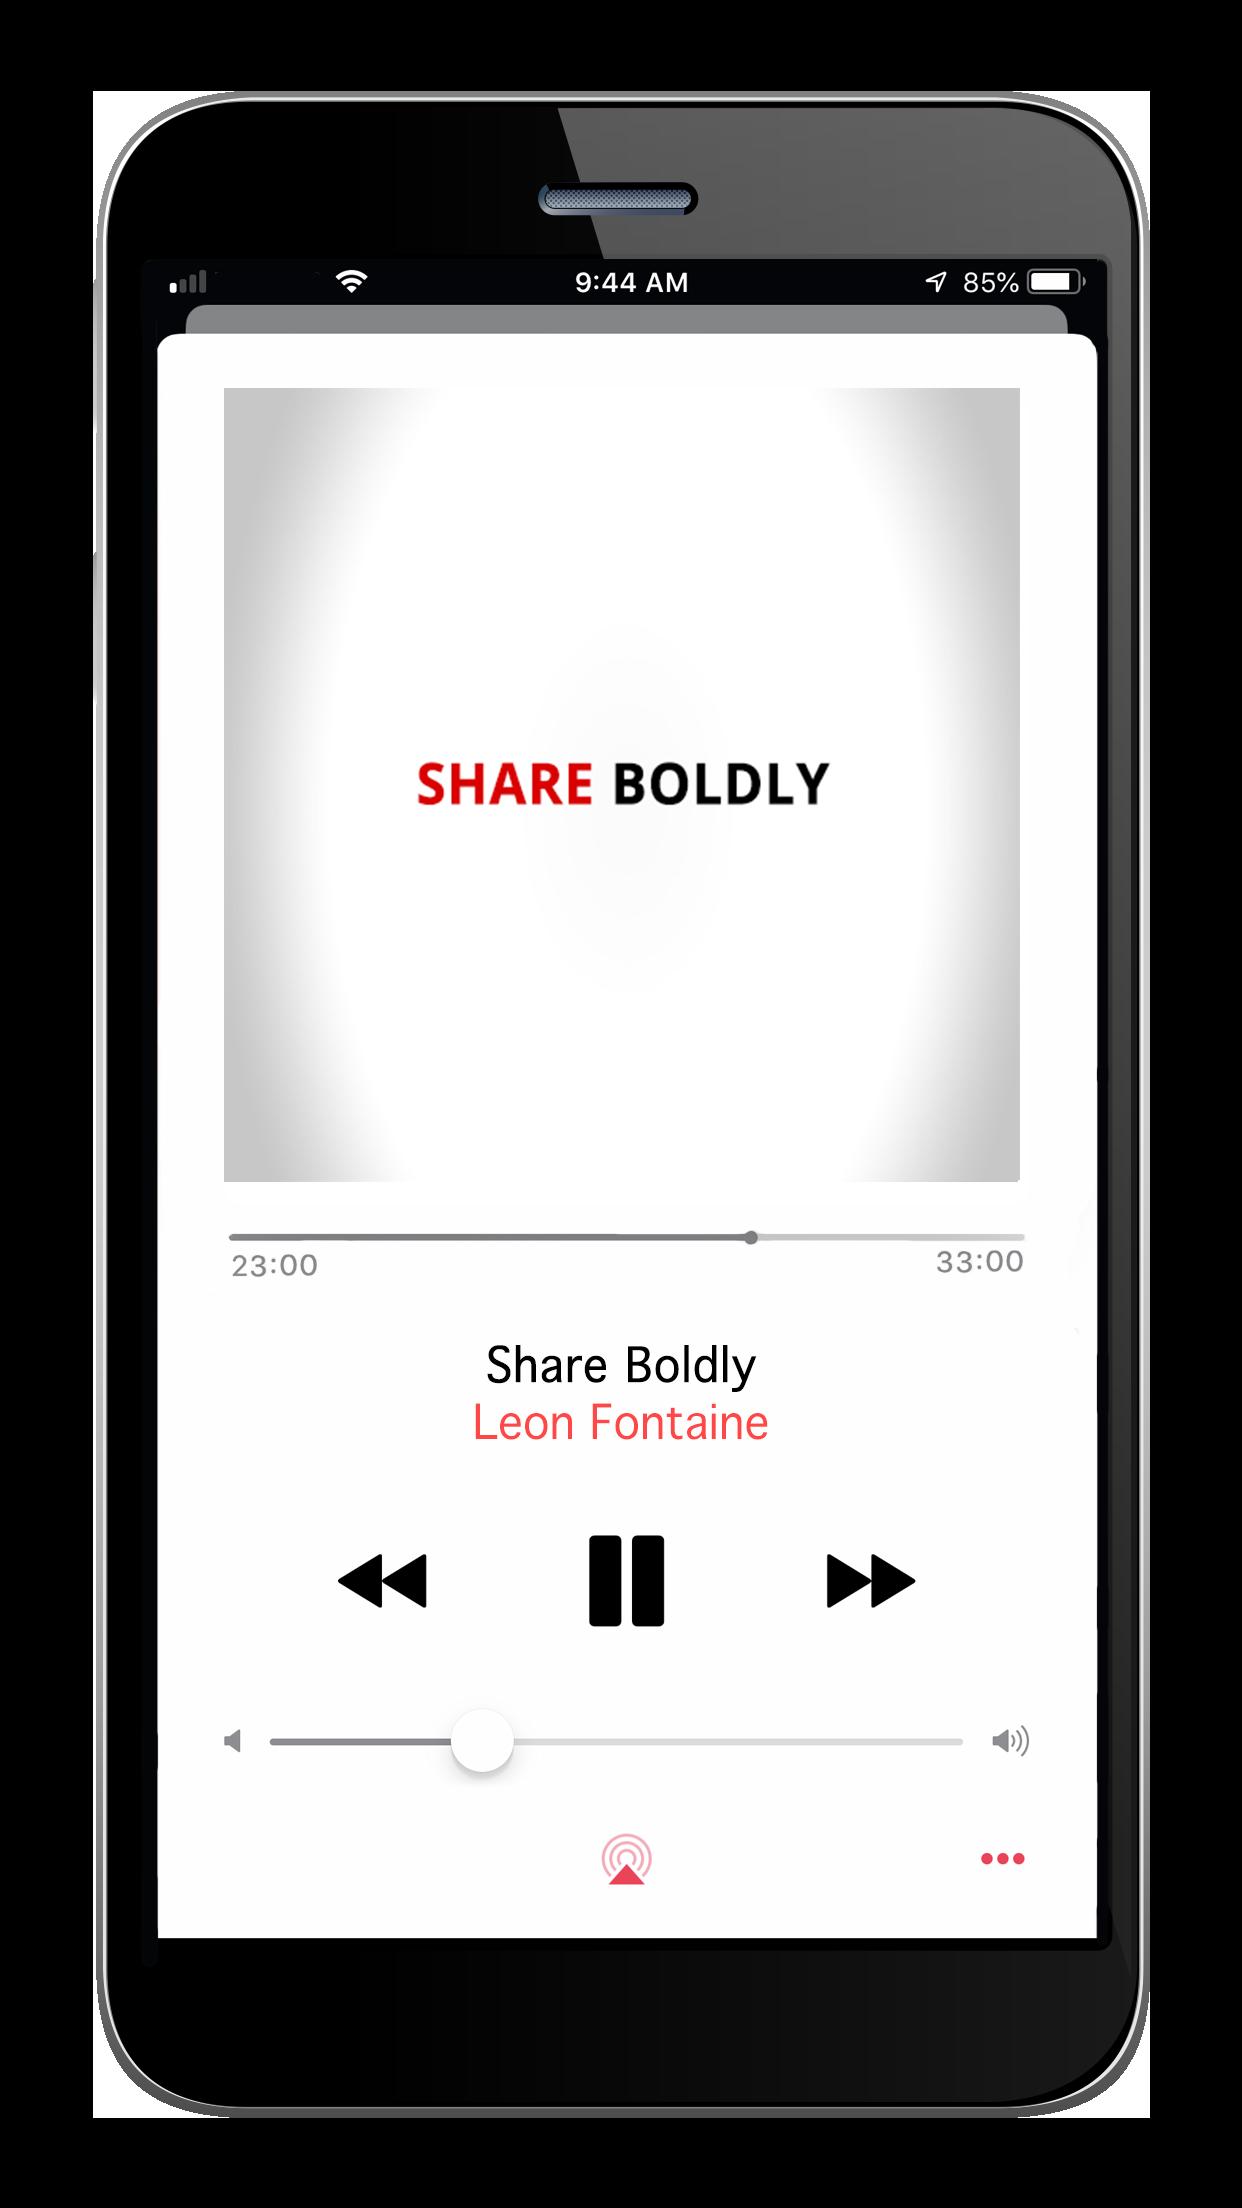 Share Boldly